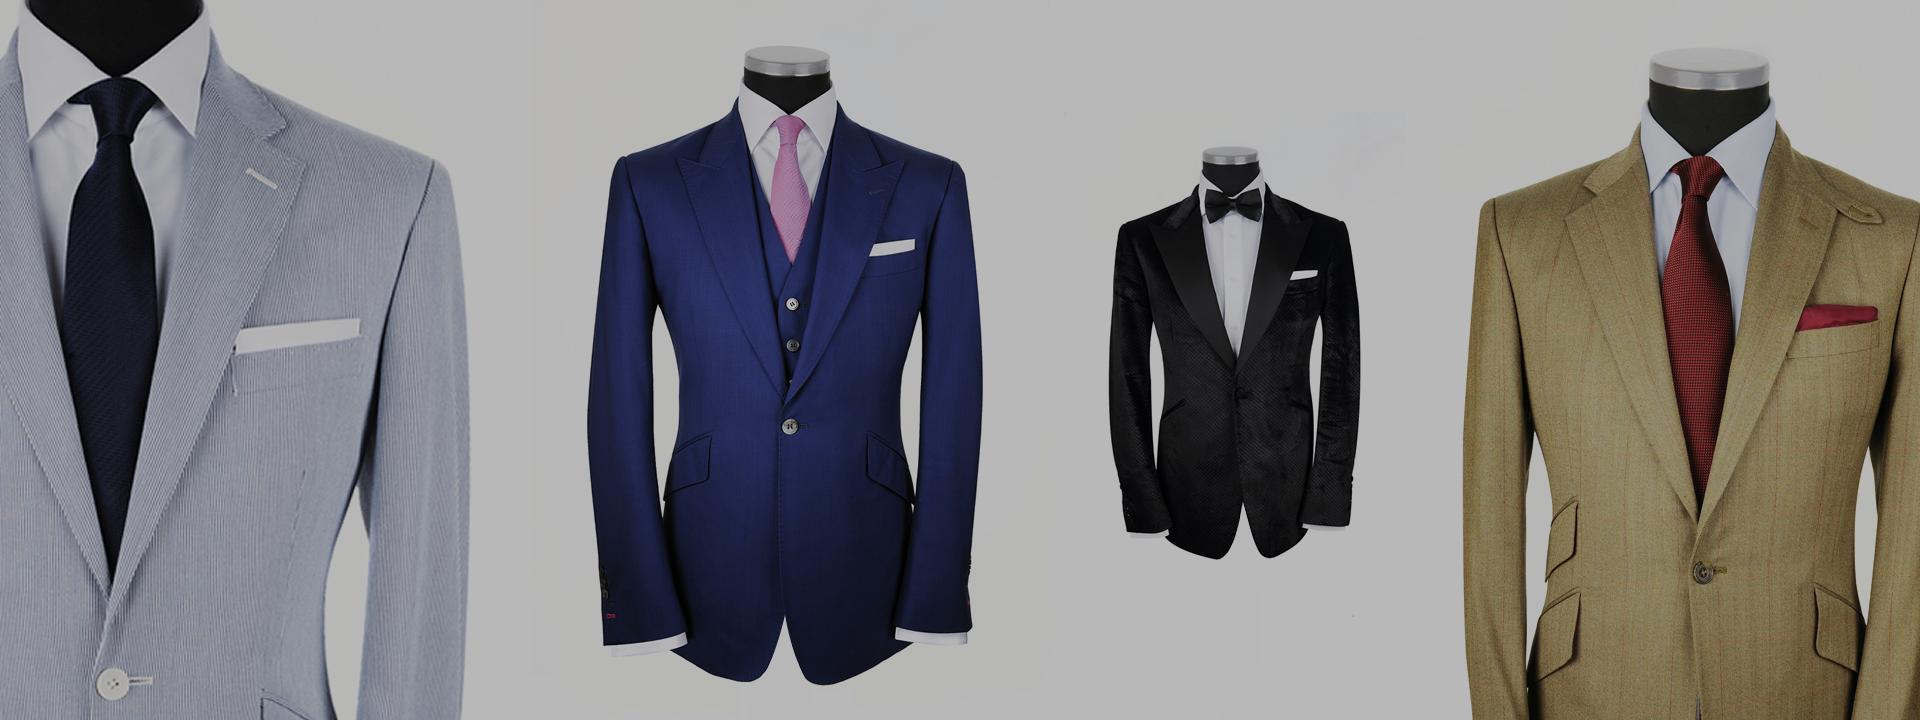 suits_header_1